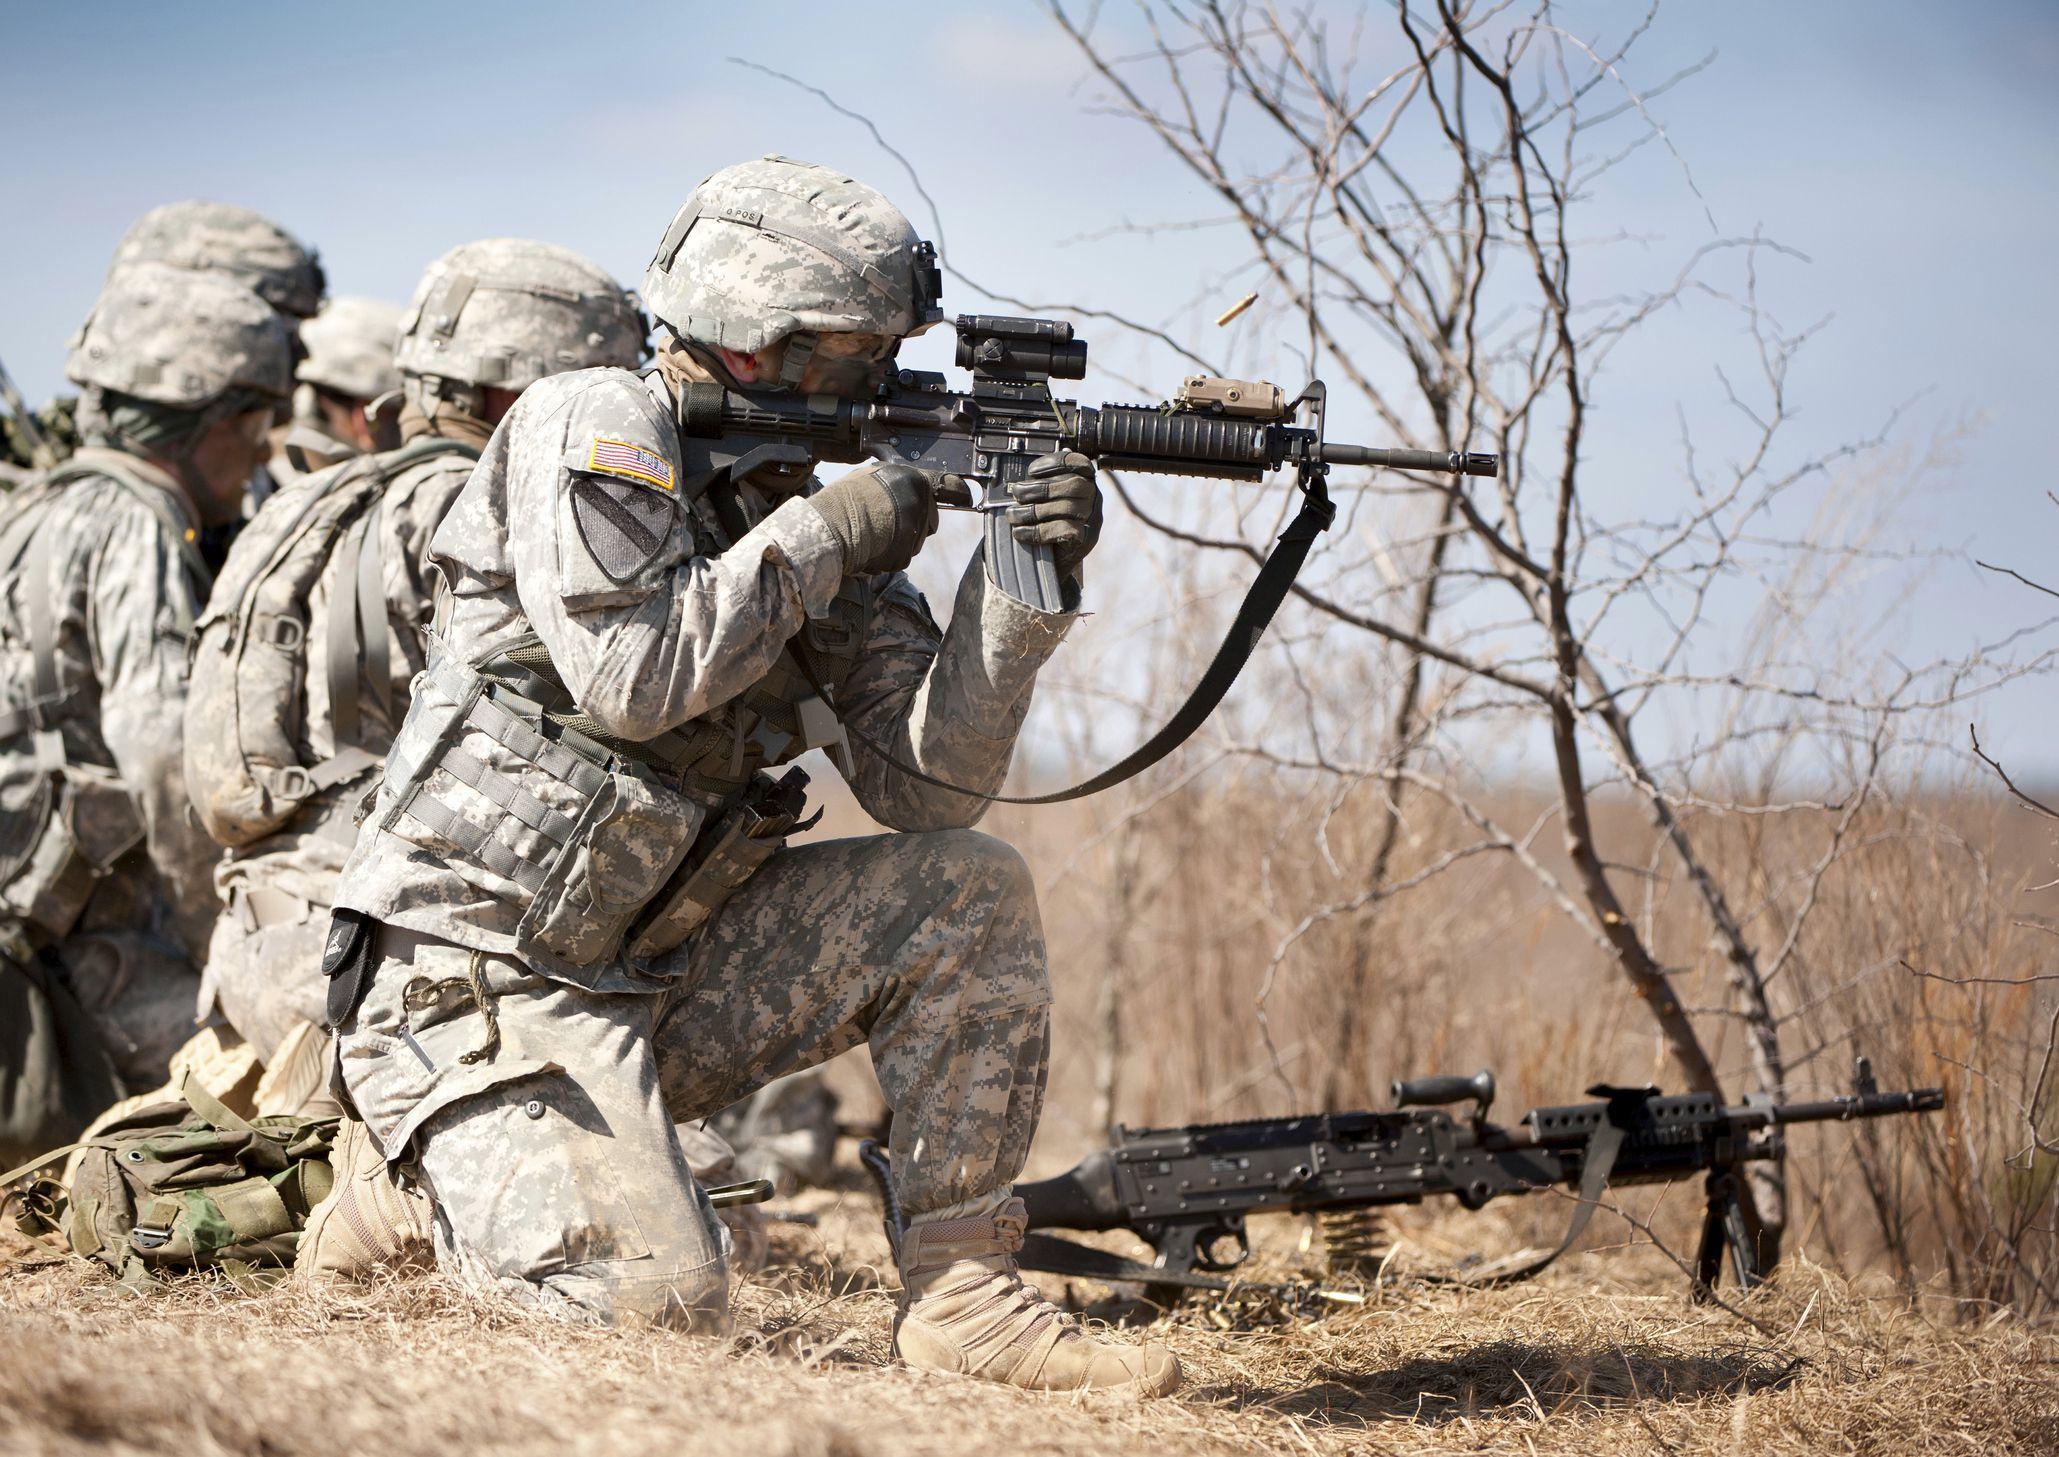 Cavalry scout mos 19d job description for Tow motor operator job description